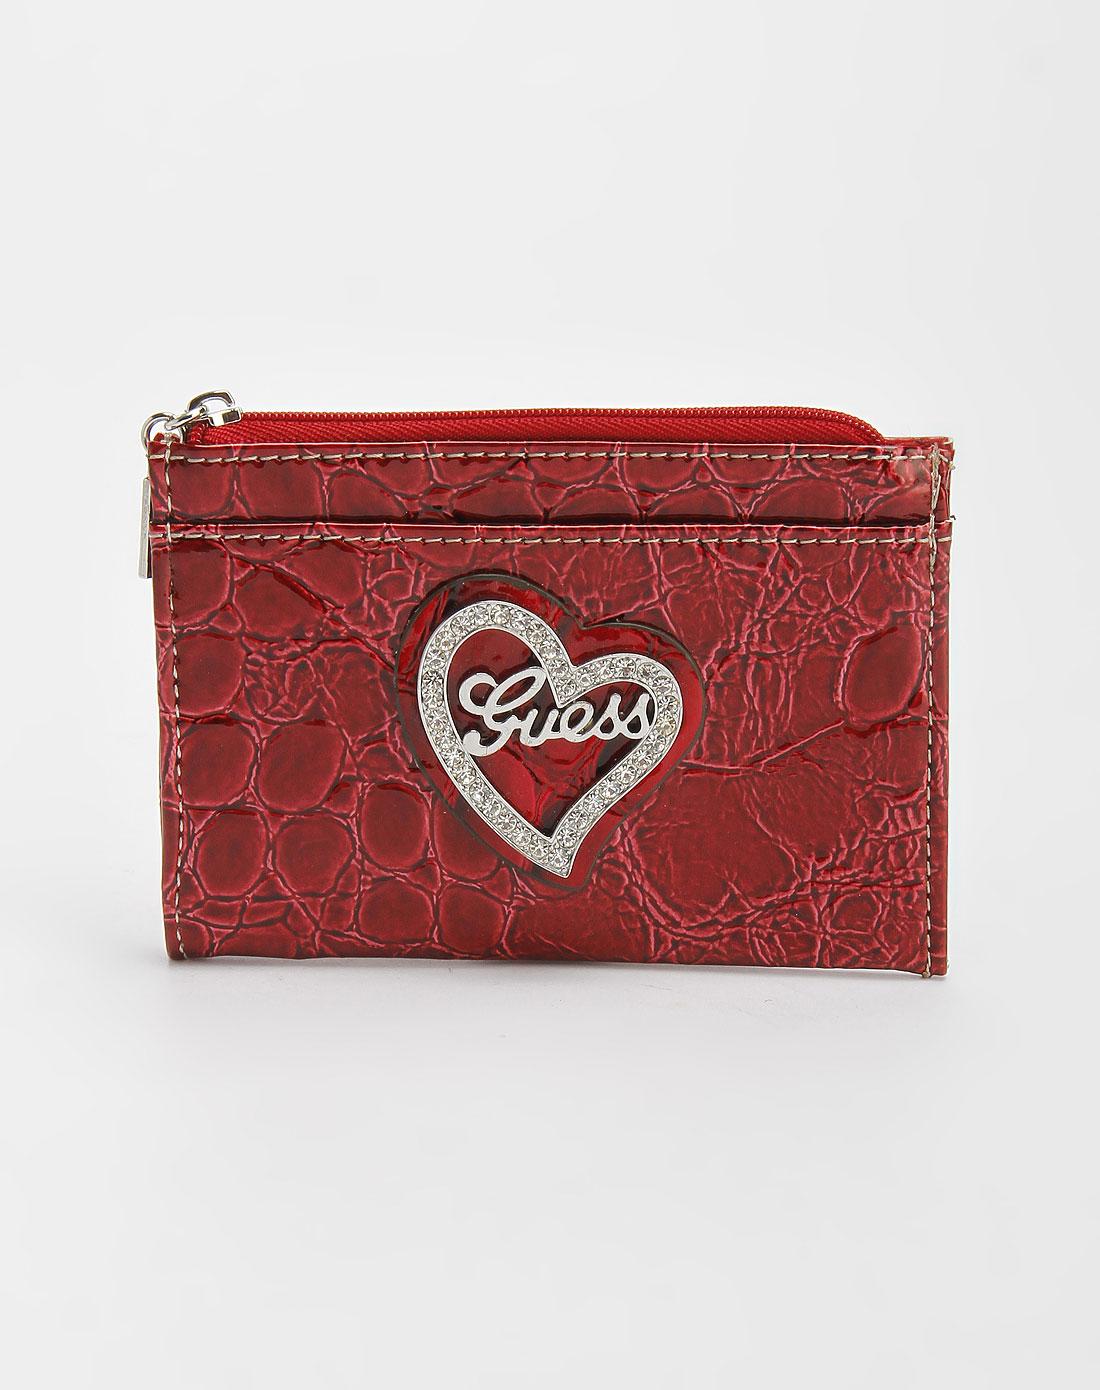 guess包包专场-女款红色石头纹零钱包